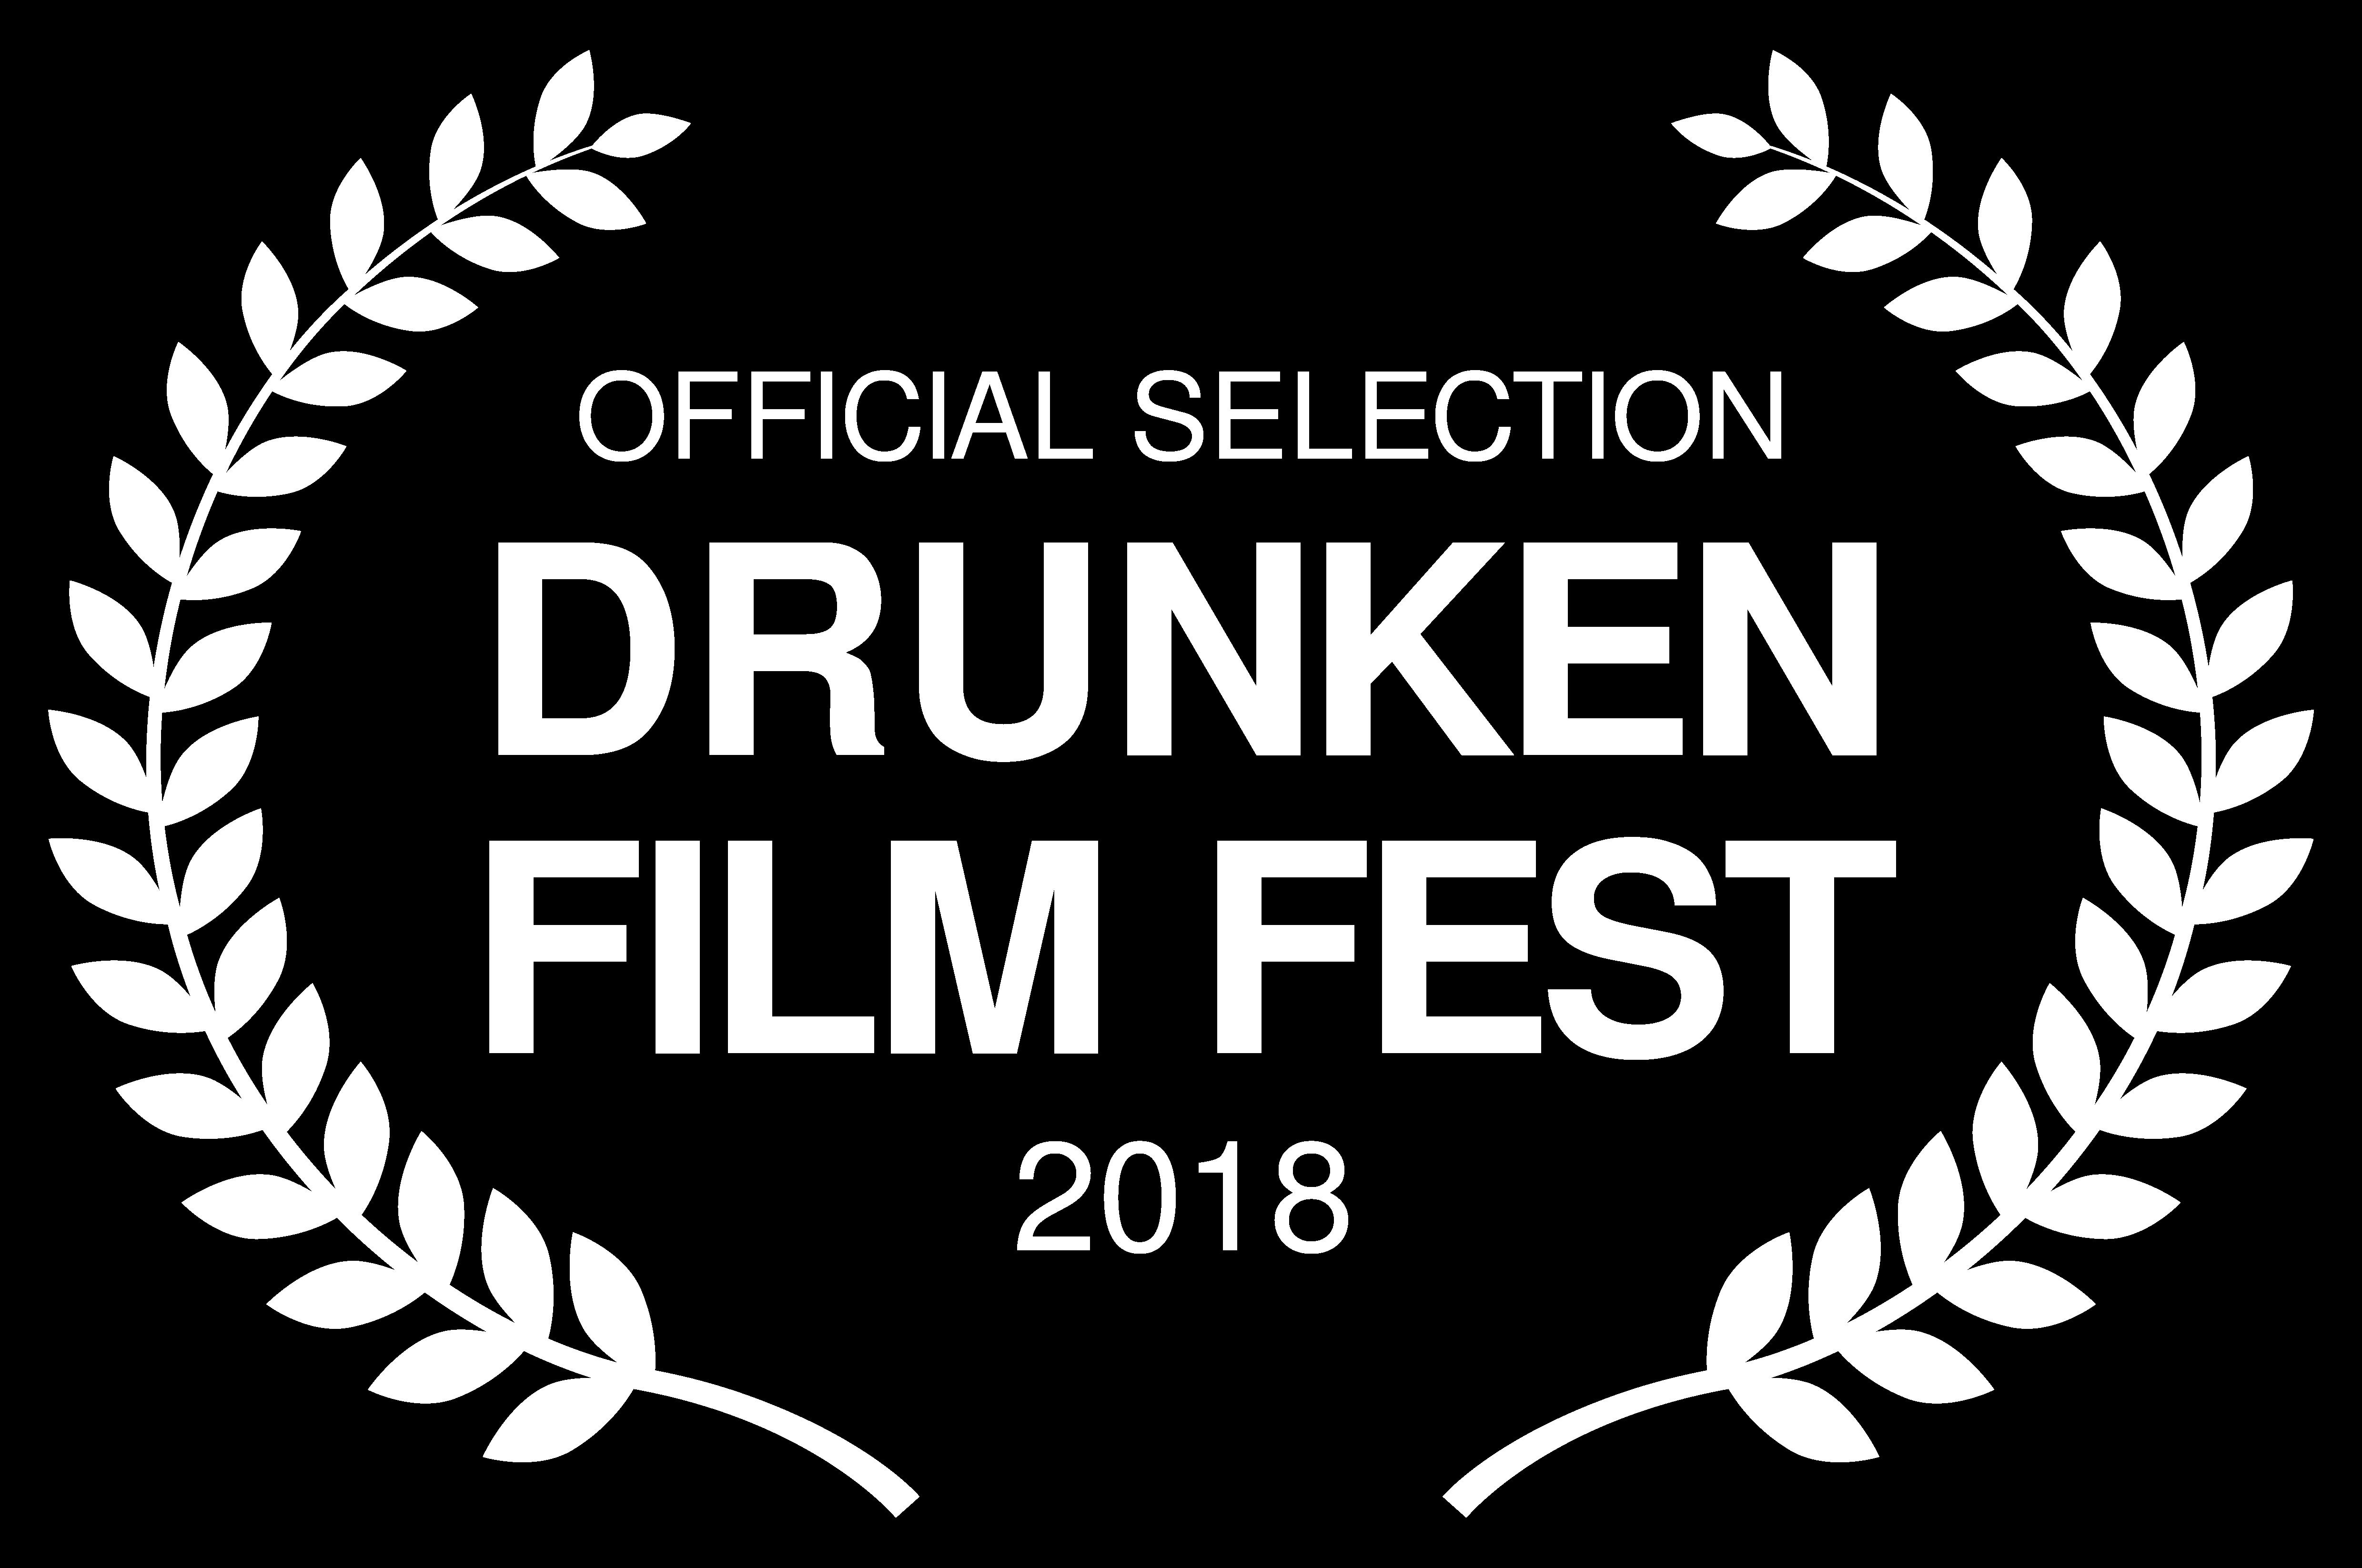 OFFICIALSELECTION-DRUNKENFILMFEST-2018